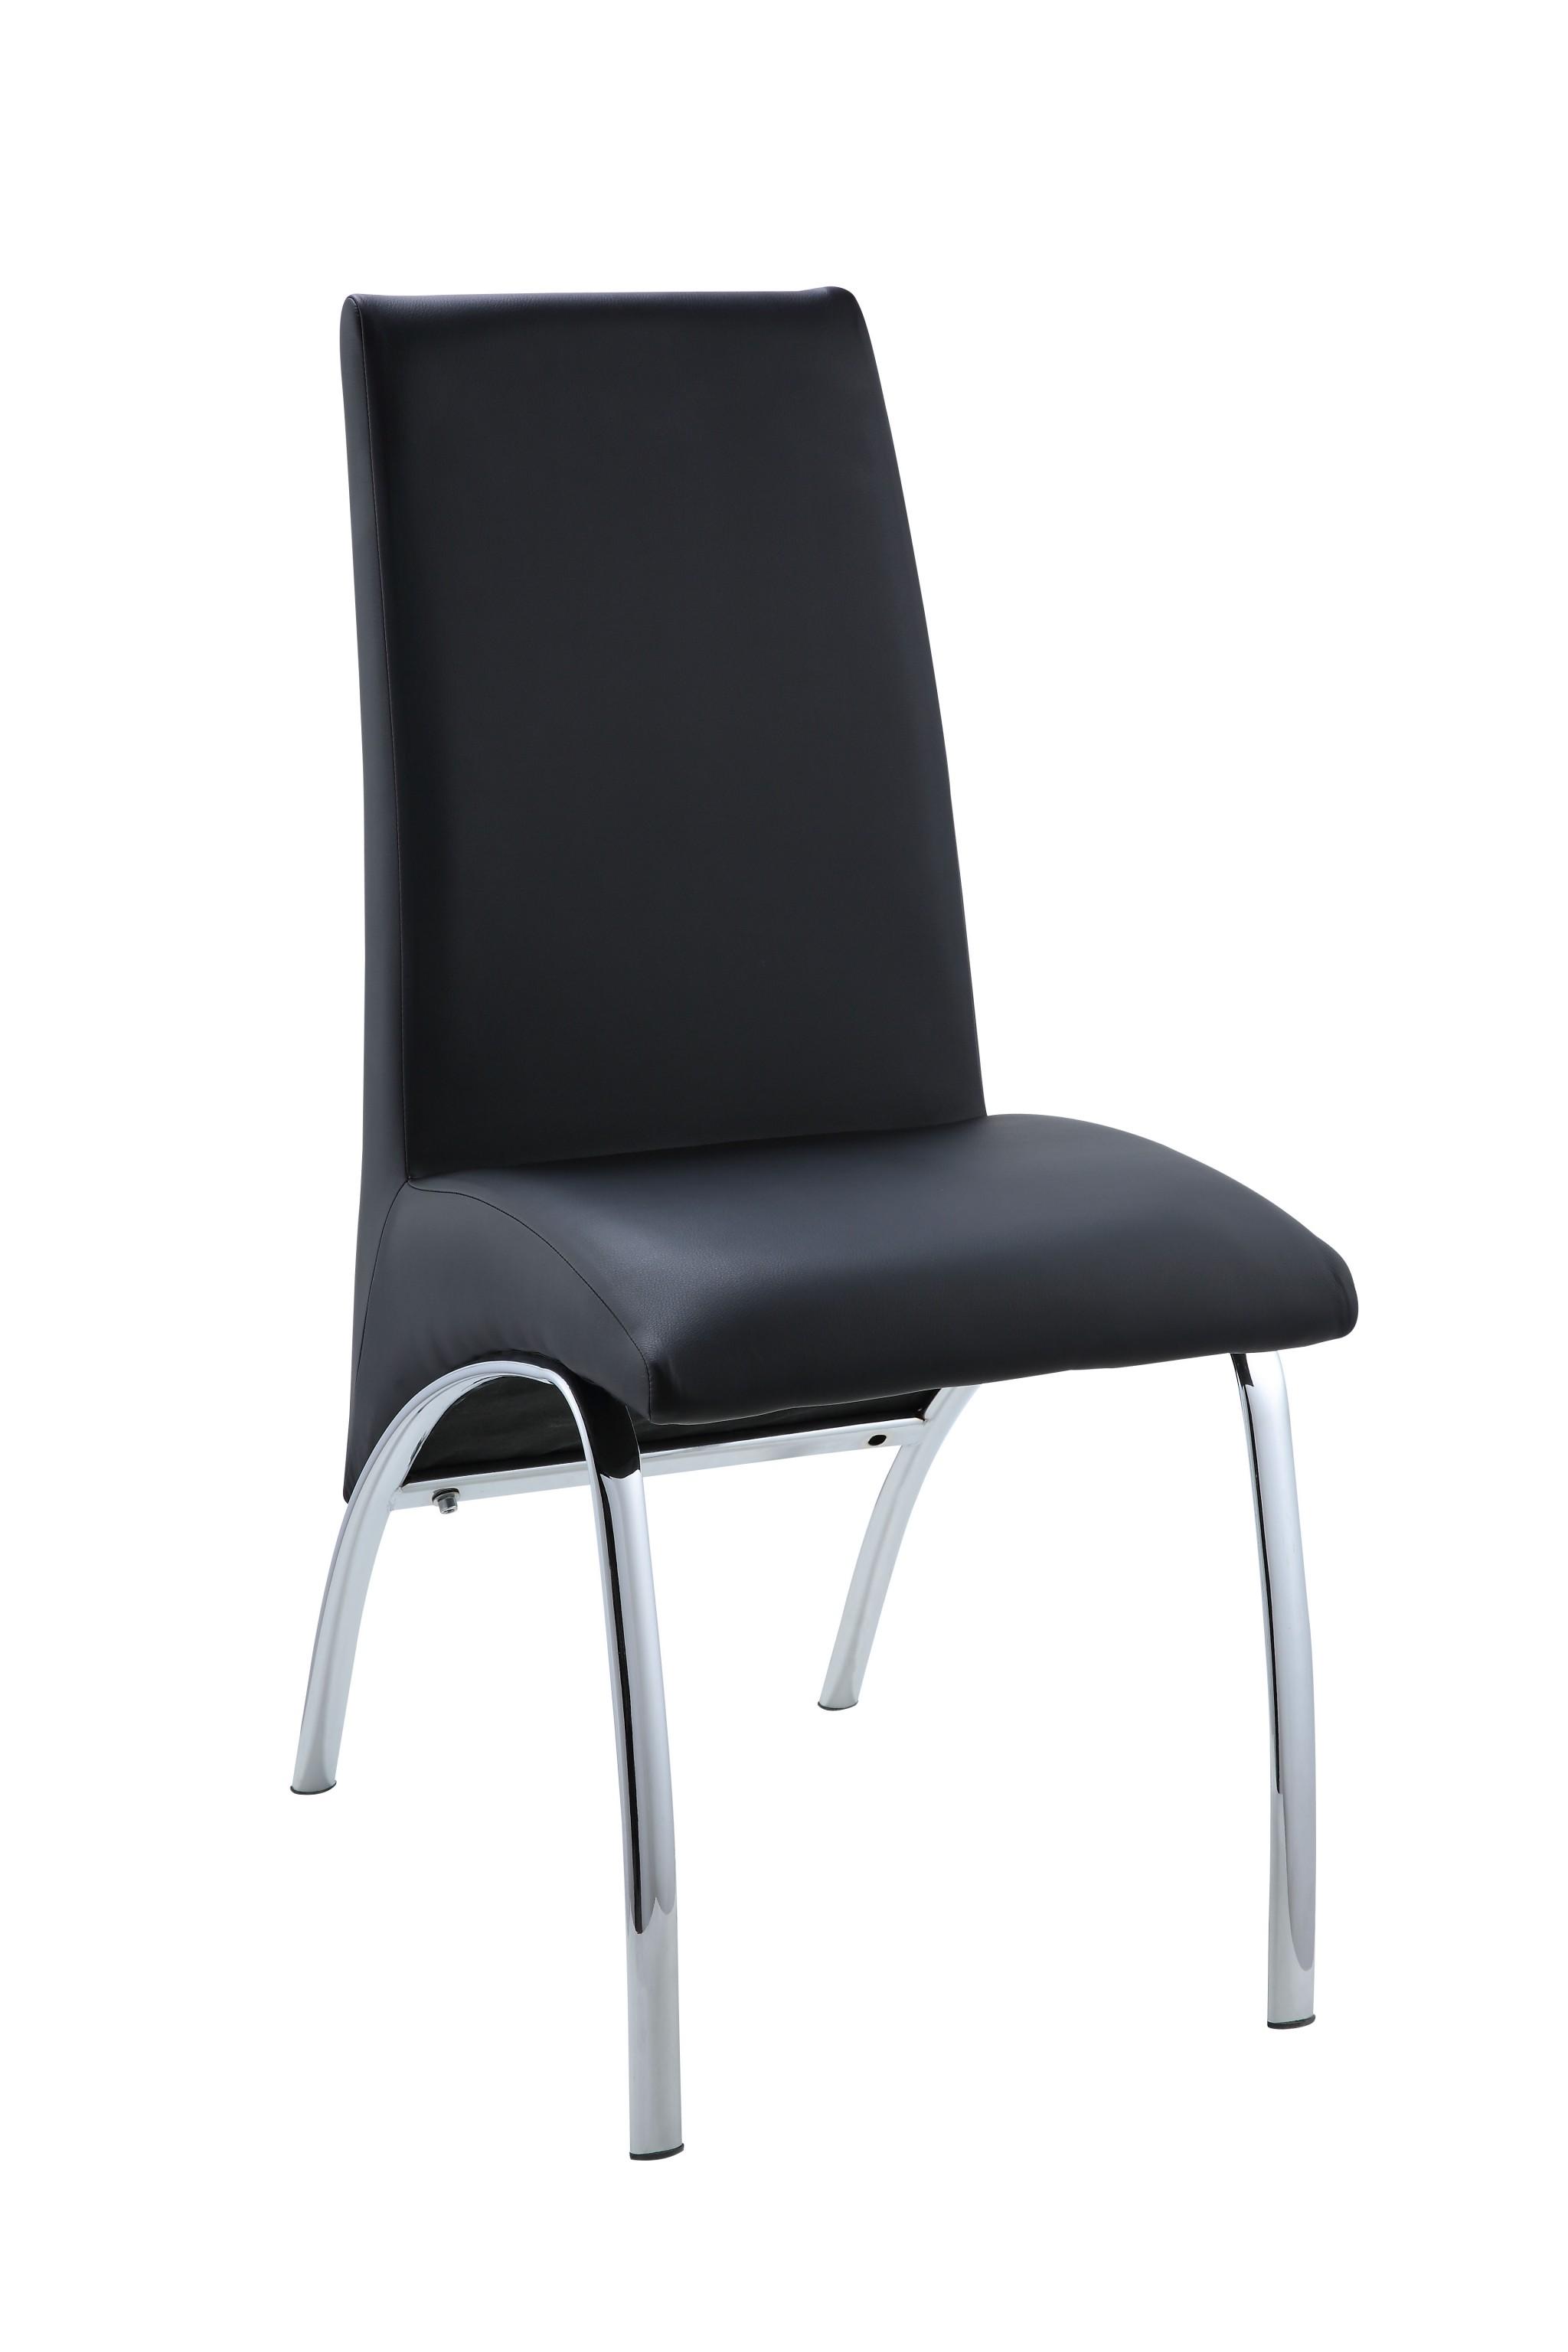 "17"" X 24"" X 38"" Black Metal Side Chair (Set-2)"